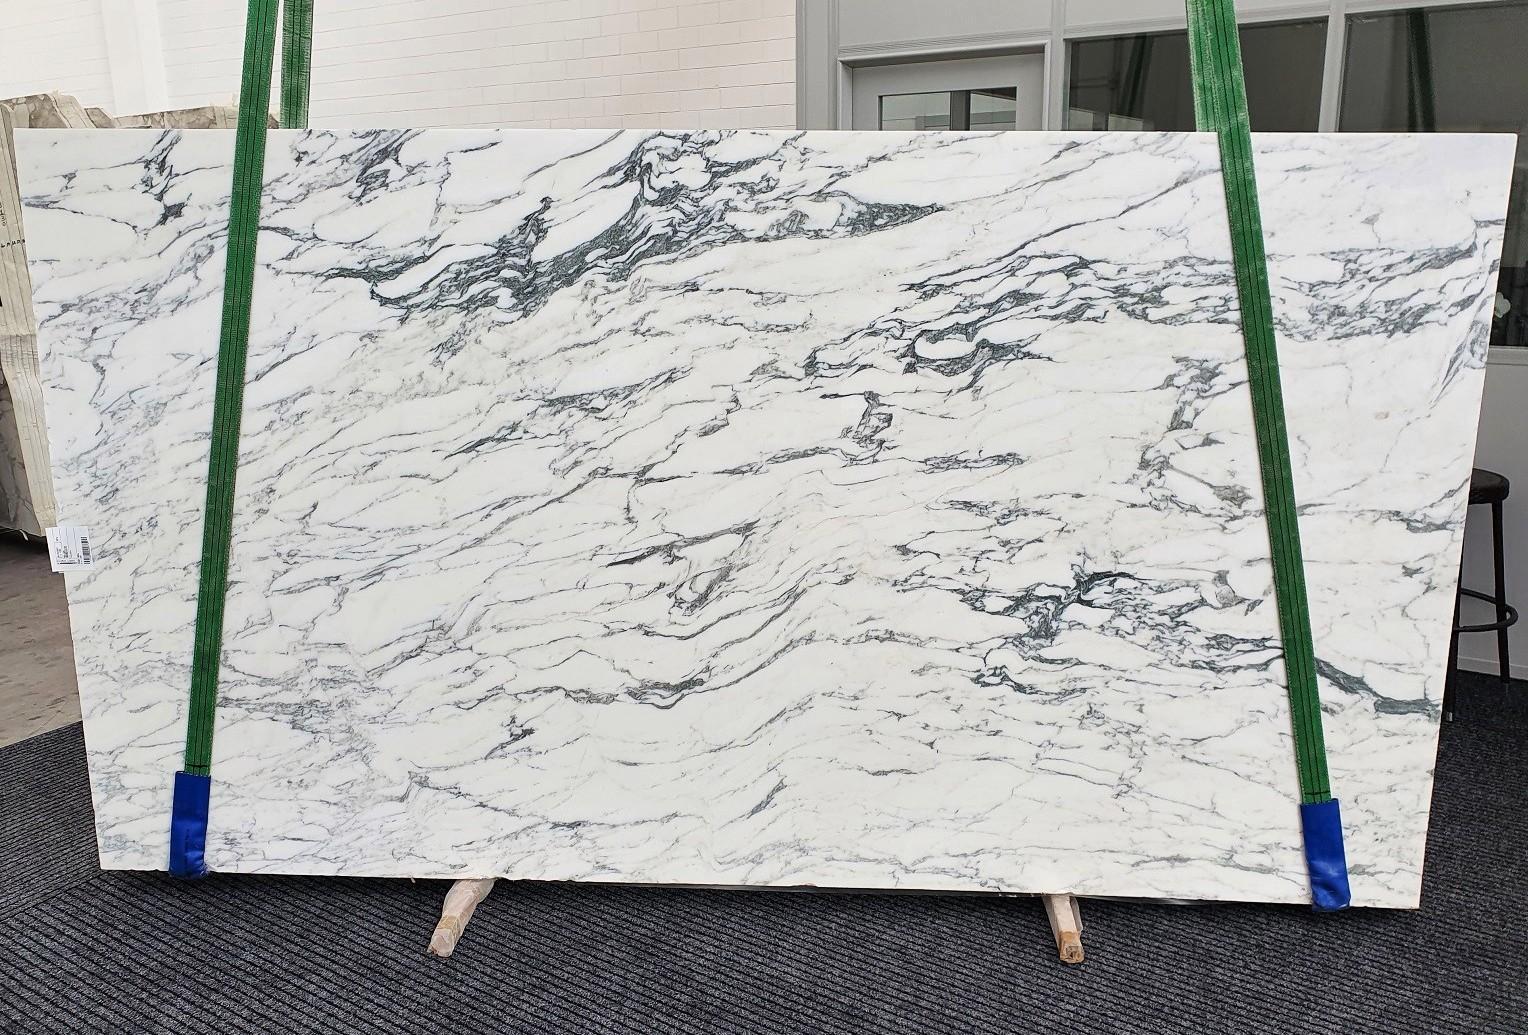 ARABESCATO FAINELLO Fourniture Veneto (Italie) d' dalles brillantes en marbre naturel 1356 , Slab #23